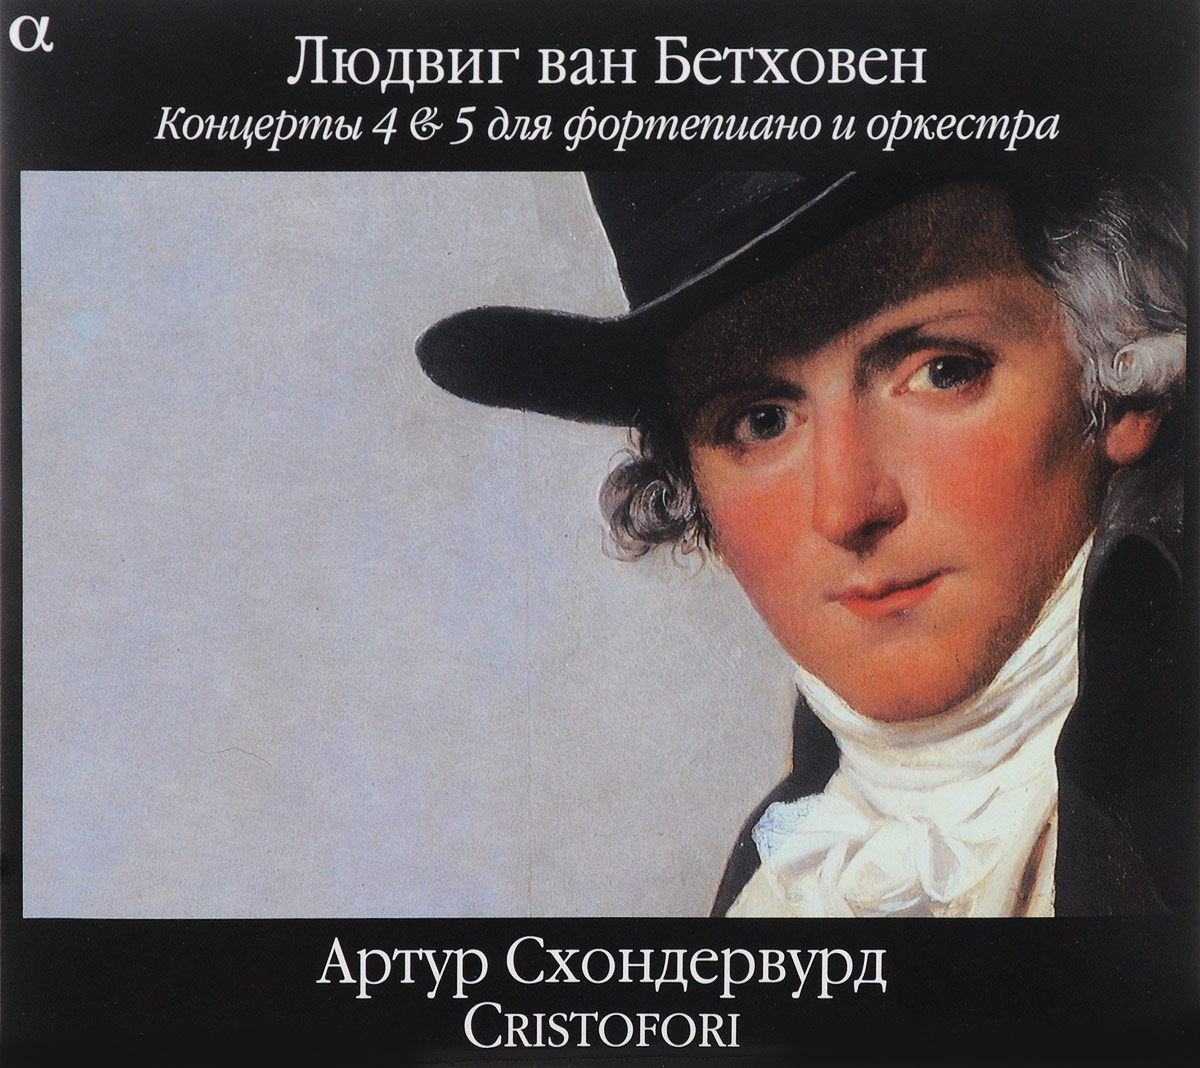 "VARIOUS. BEETHOVEN, LUDWIG VAN/CONCERTOS POUR PIANOFORTE AVEC ORCHESTRE NO 4, OP. 58 & NO 5 , OP. 73  ""EMPEREUR"" / ARTHUR SCHOONDERWOERD, PIANOFORTE (JOHANN FRITZ, VIENNE 1807/1810) - ENSEMBLE CRISTOFORI. 1 various sibelius goldmark violin concertos"